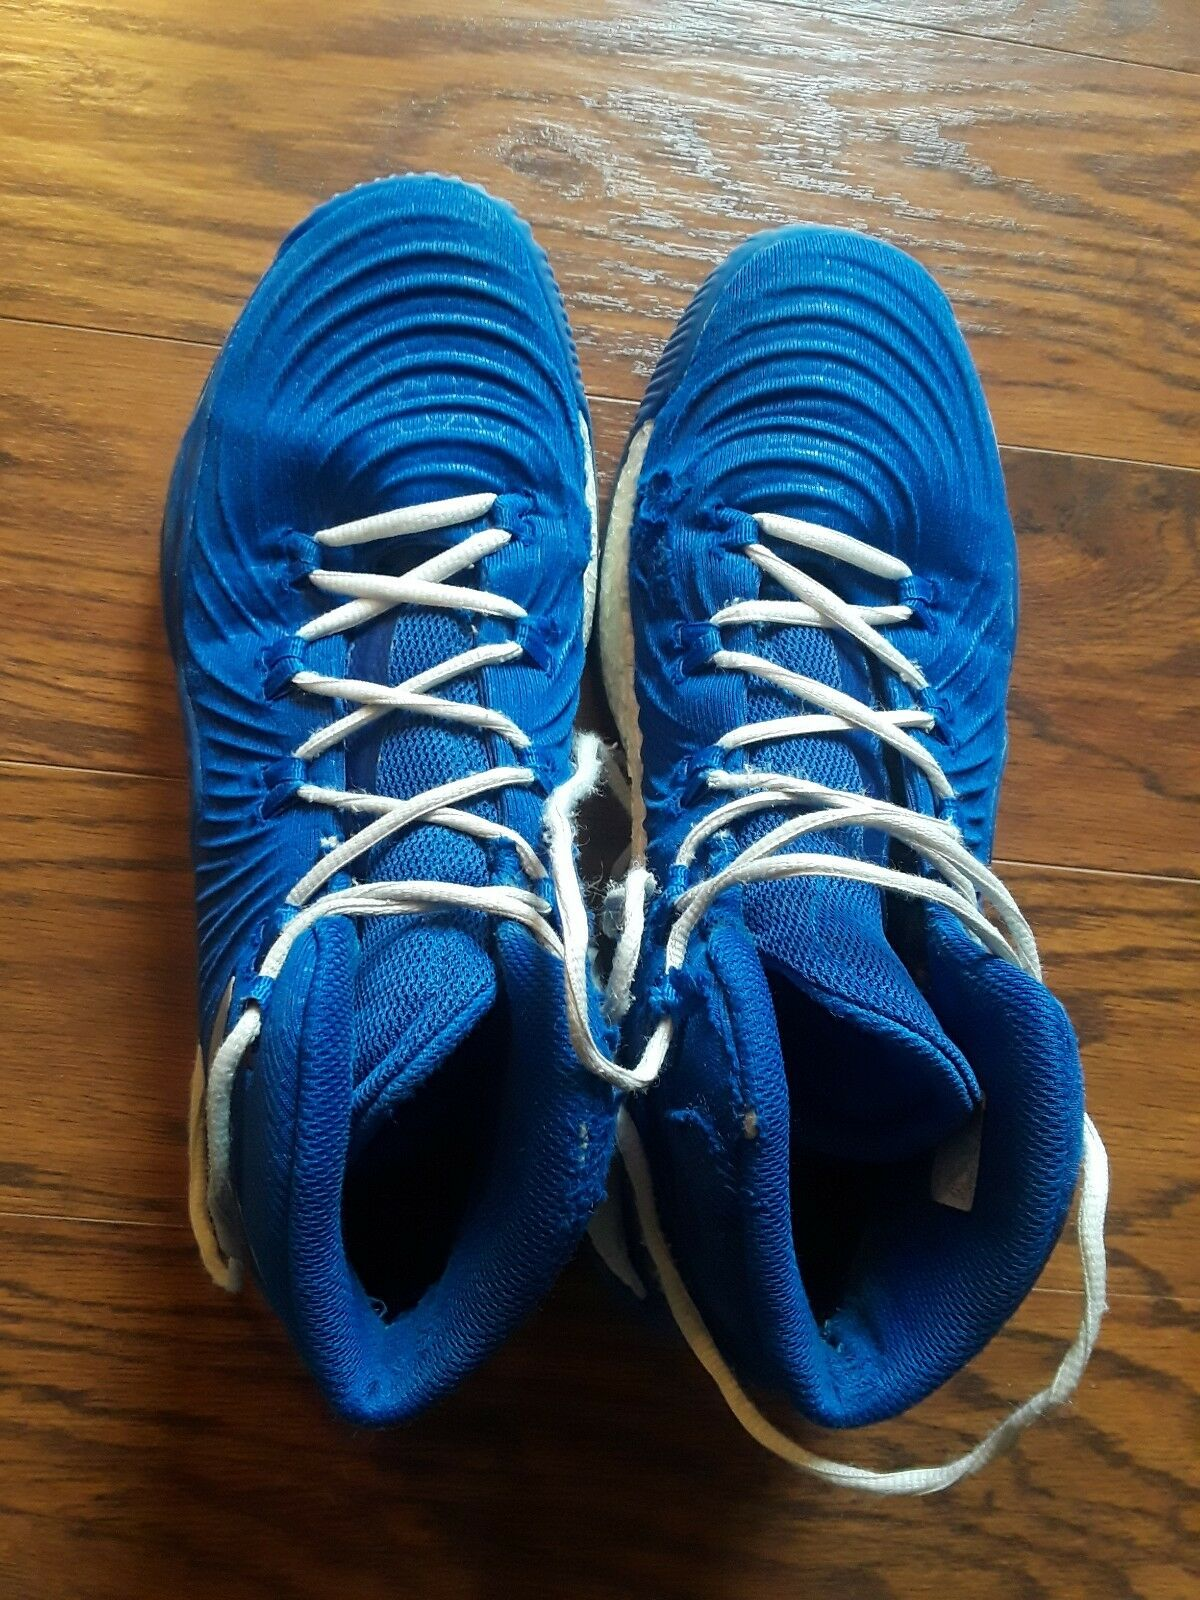 Adidas mens scarpe da basket, basket, basket, volume 10, Coloreeee blu, geofit | Qualità e consumatori in primo luogo  4f0e87